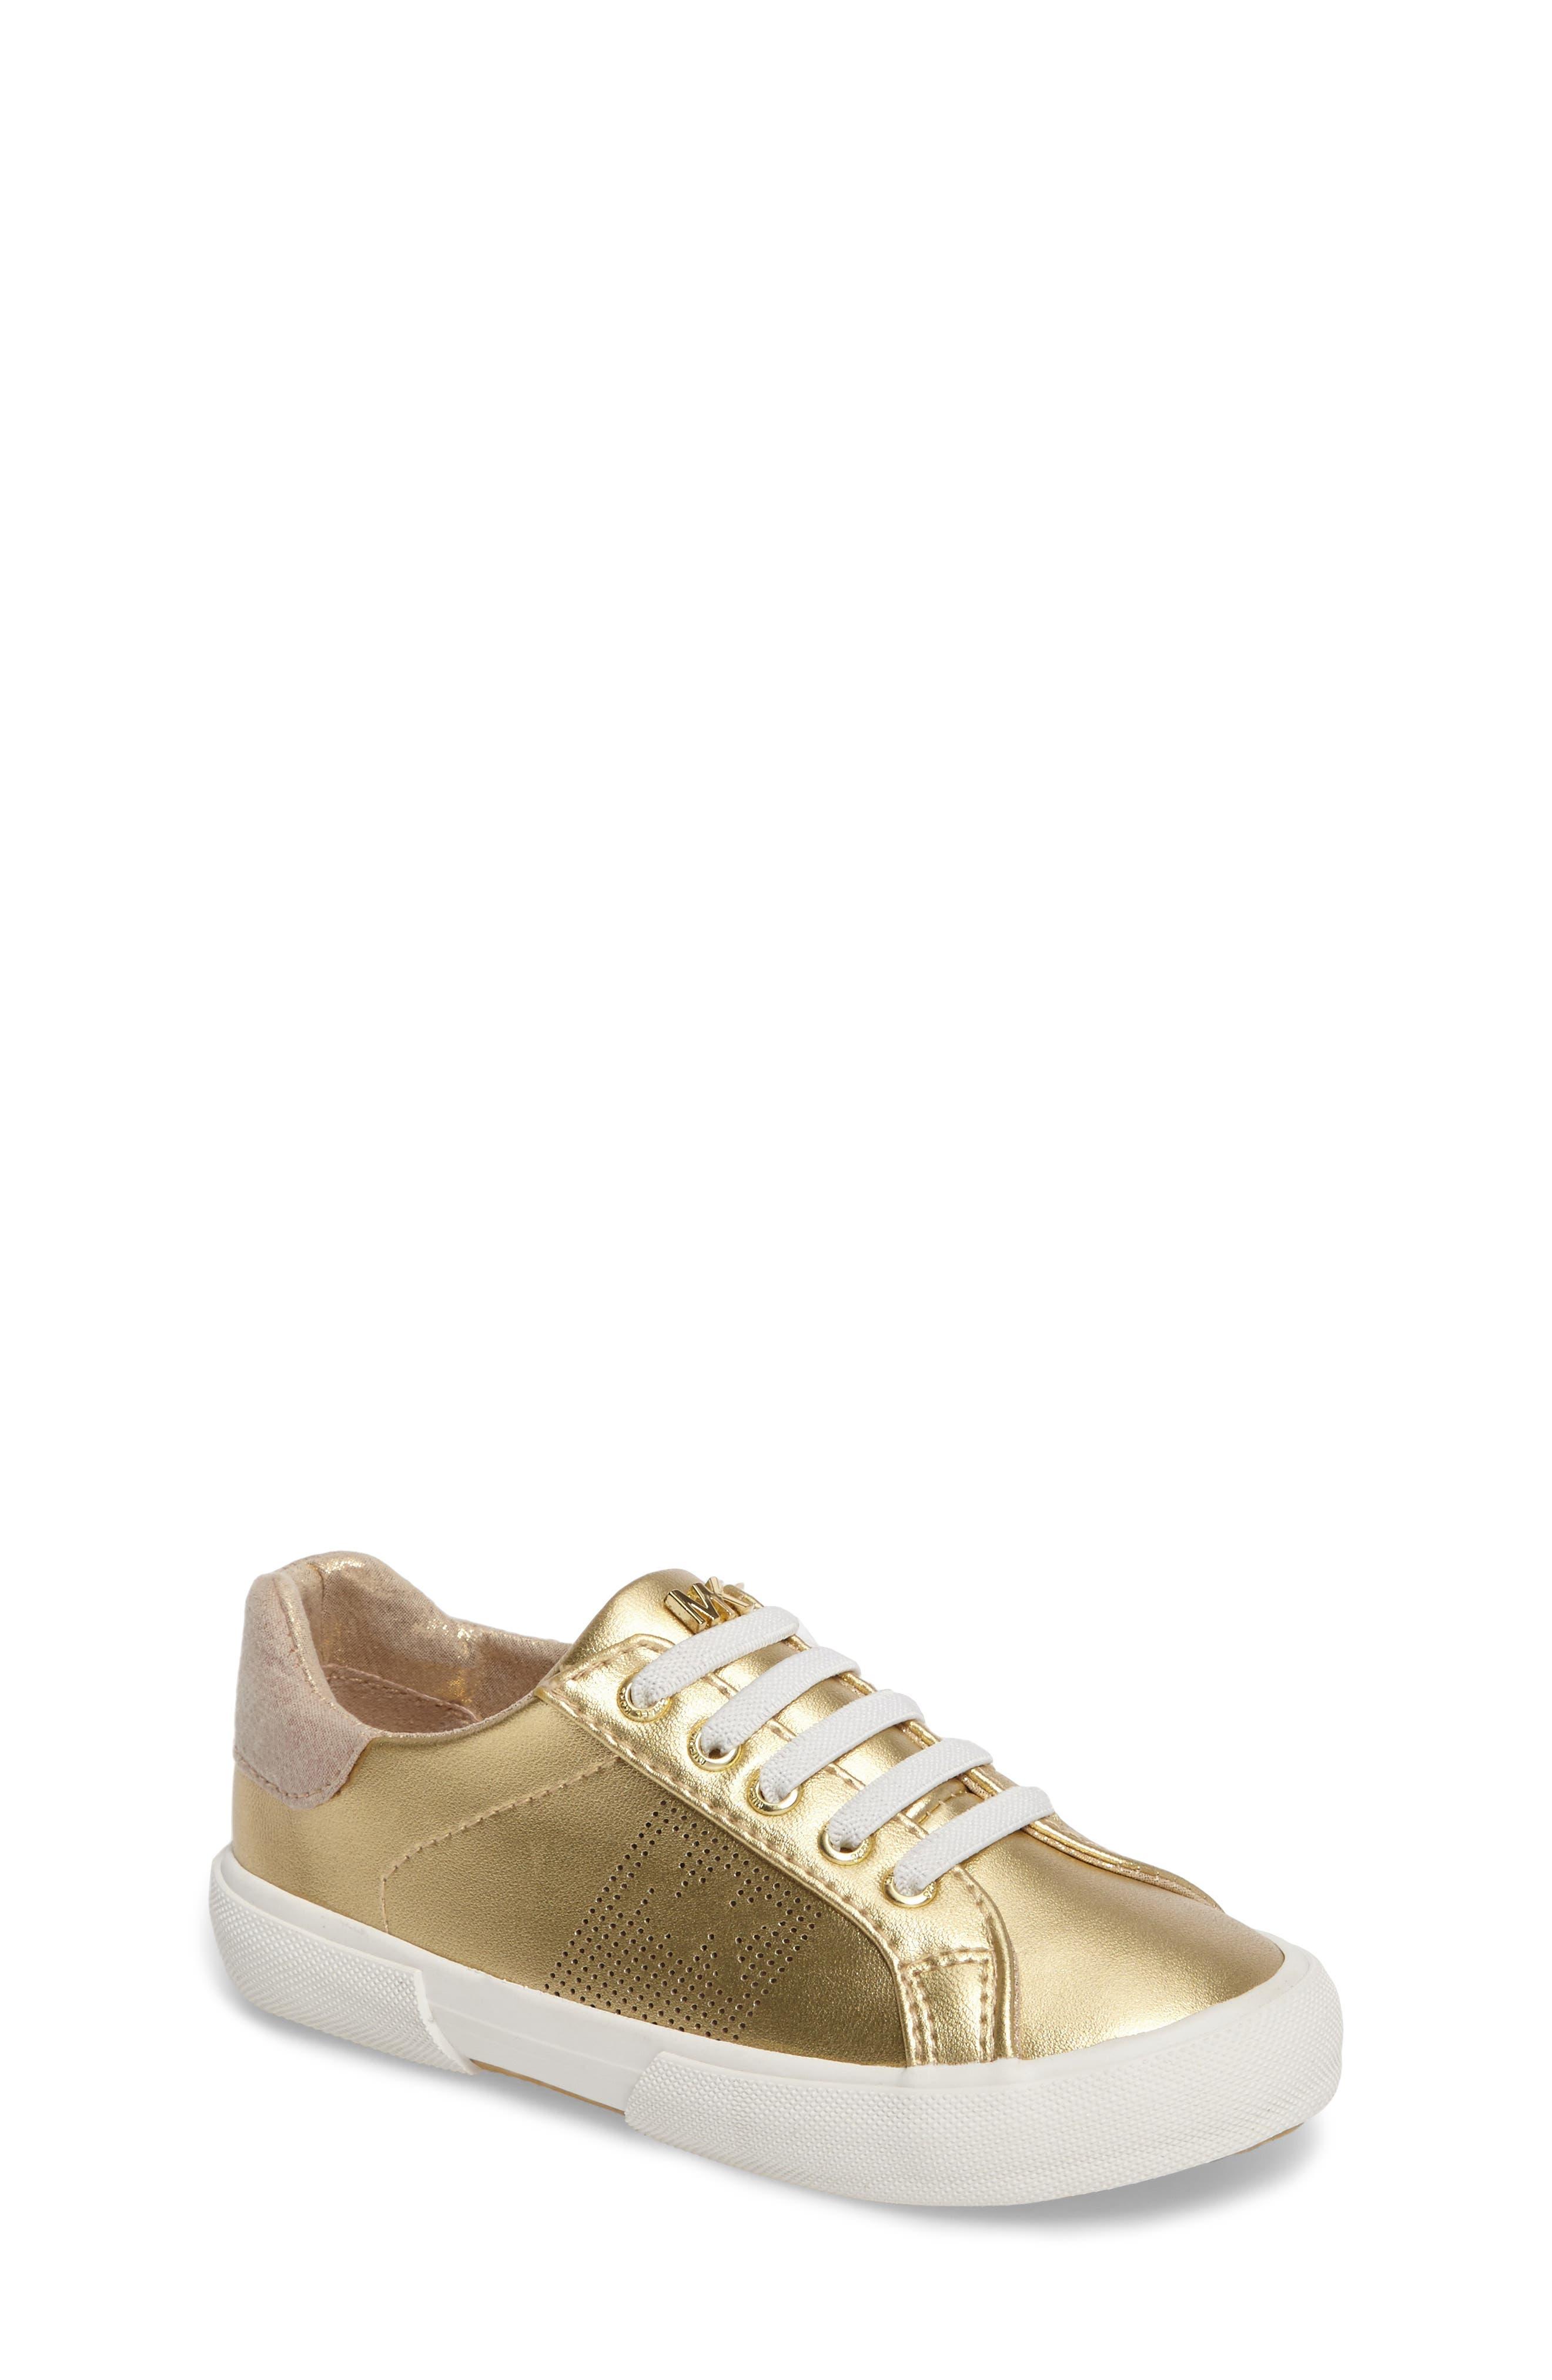 MICHAEL Michael Kors Ima Court Sneaker (Walker, Toddler, Little Kid & Big Kid)